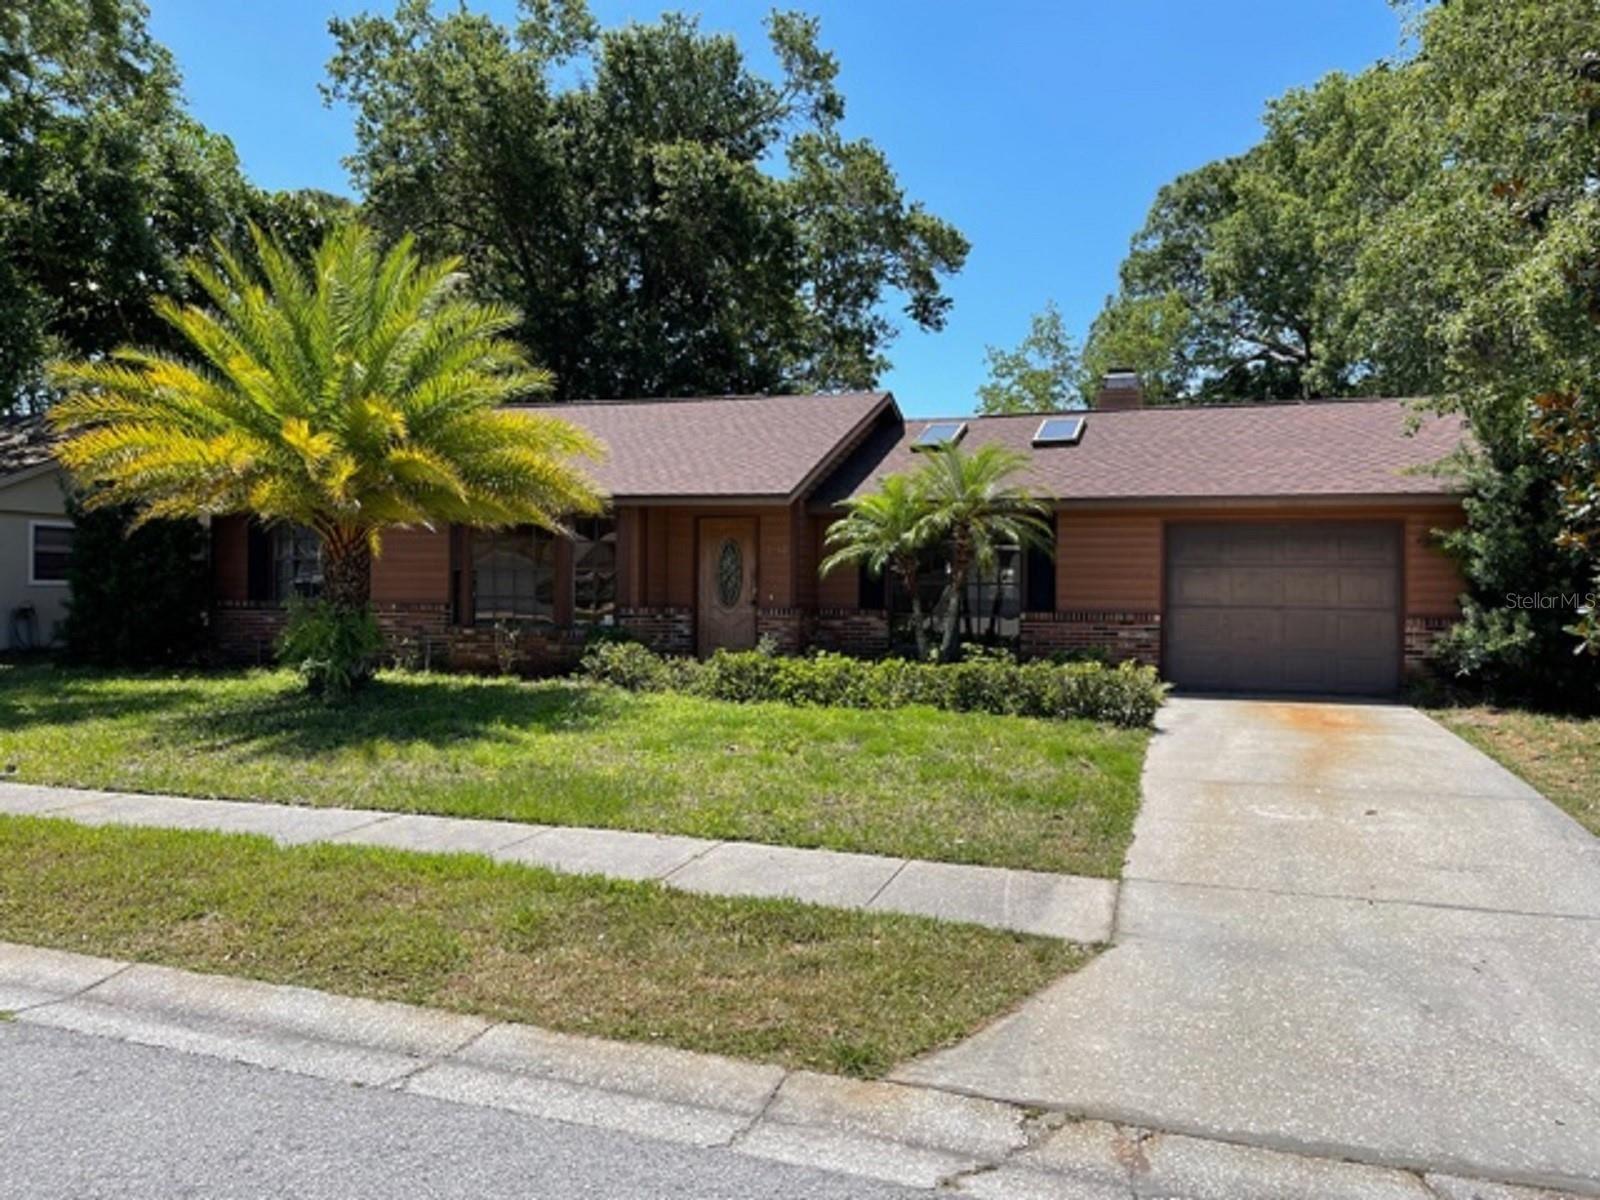 2942 WOODPINE CIRCLE, Sarasota, FL 34231 - #: A4500655